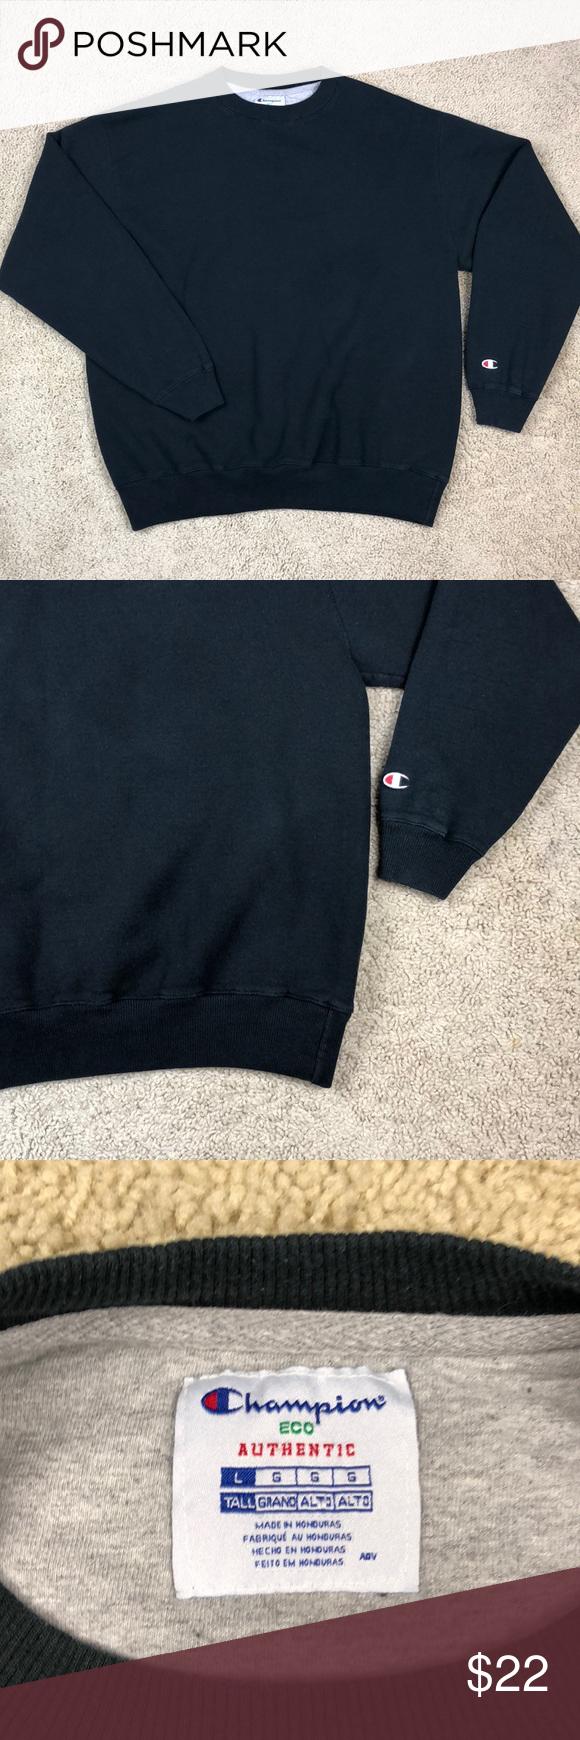 Champion Eco Authentic Black Crewneck Sweater Lg Black Crewneck Crew Neck Sweater Fashion [ 1740 x 580 Pixel ]